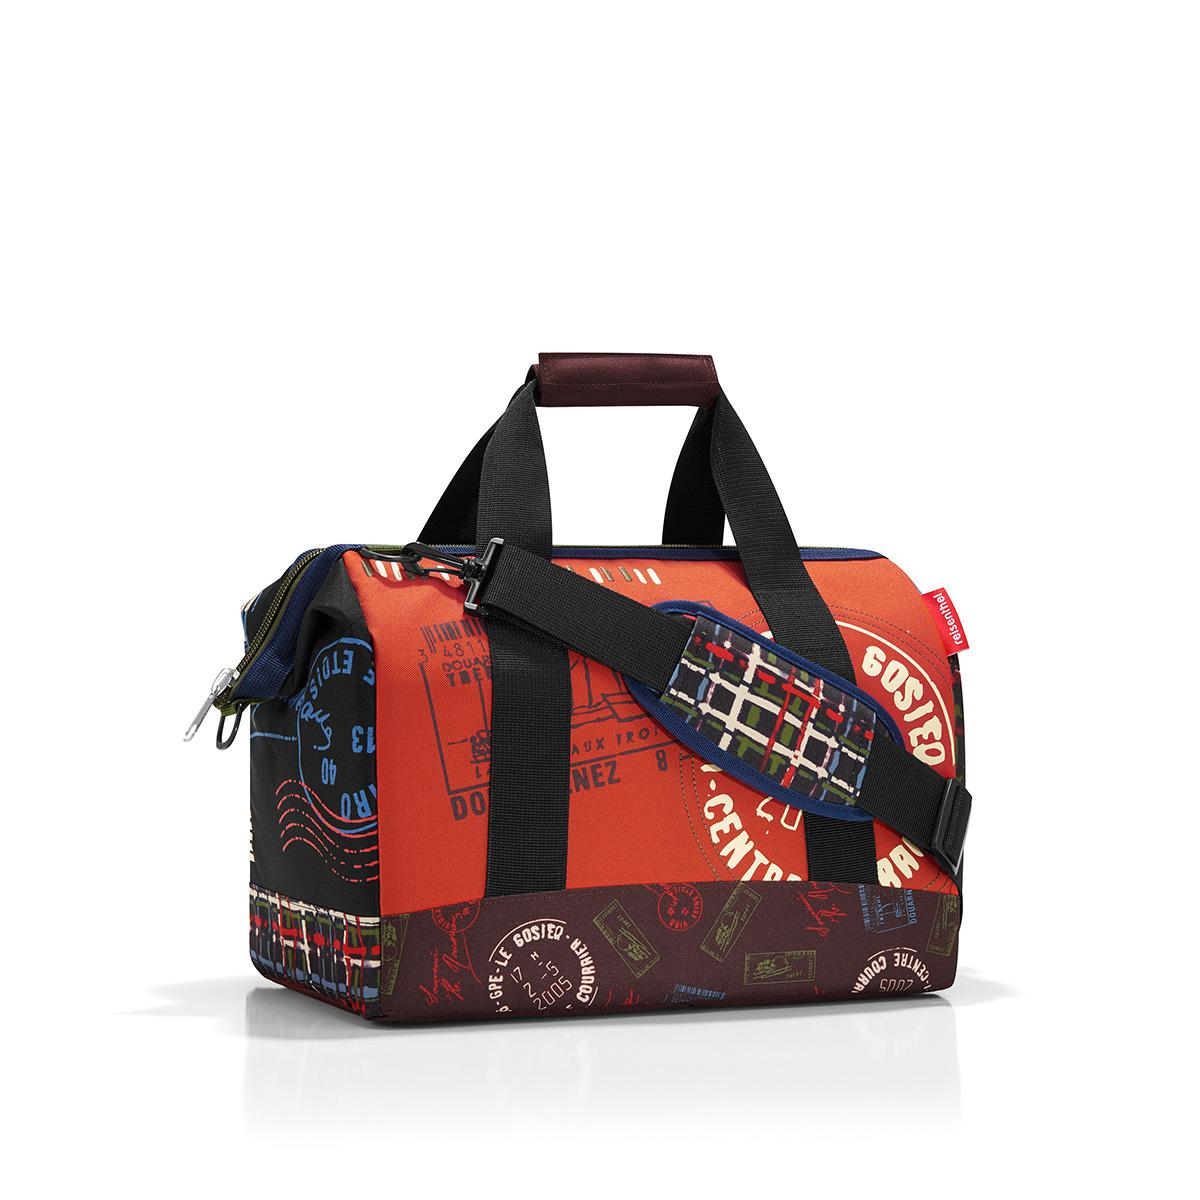 Сумка дорожная женская Reisenthel Allrounder, цвет: оранжевый. MS7037 сумка allrounder l special edition stamps